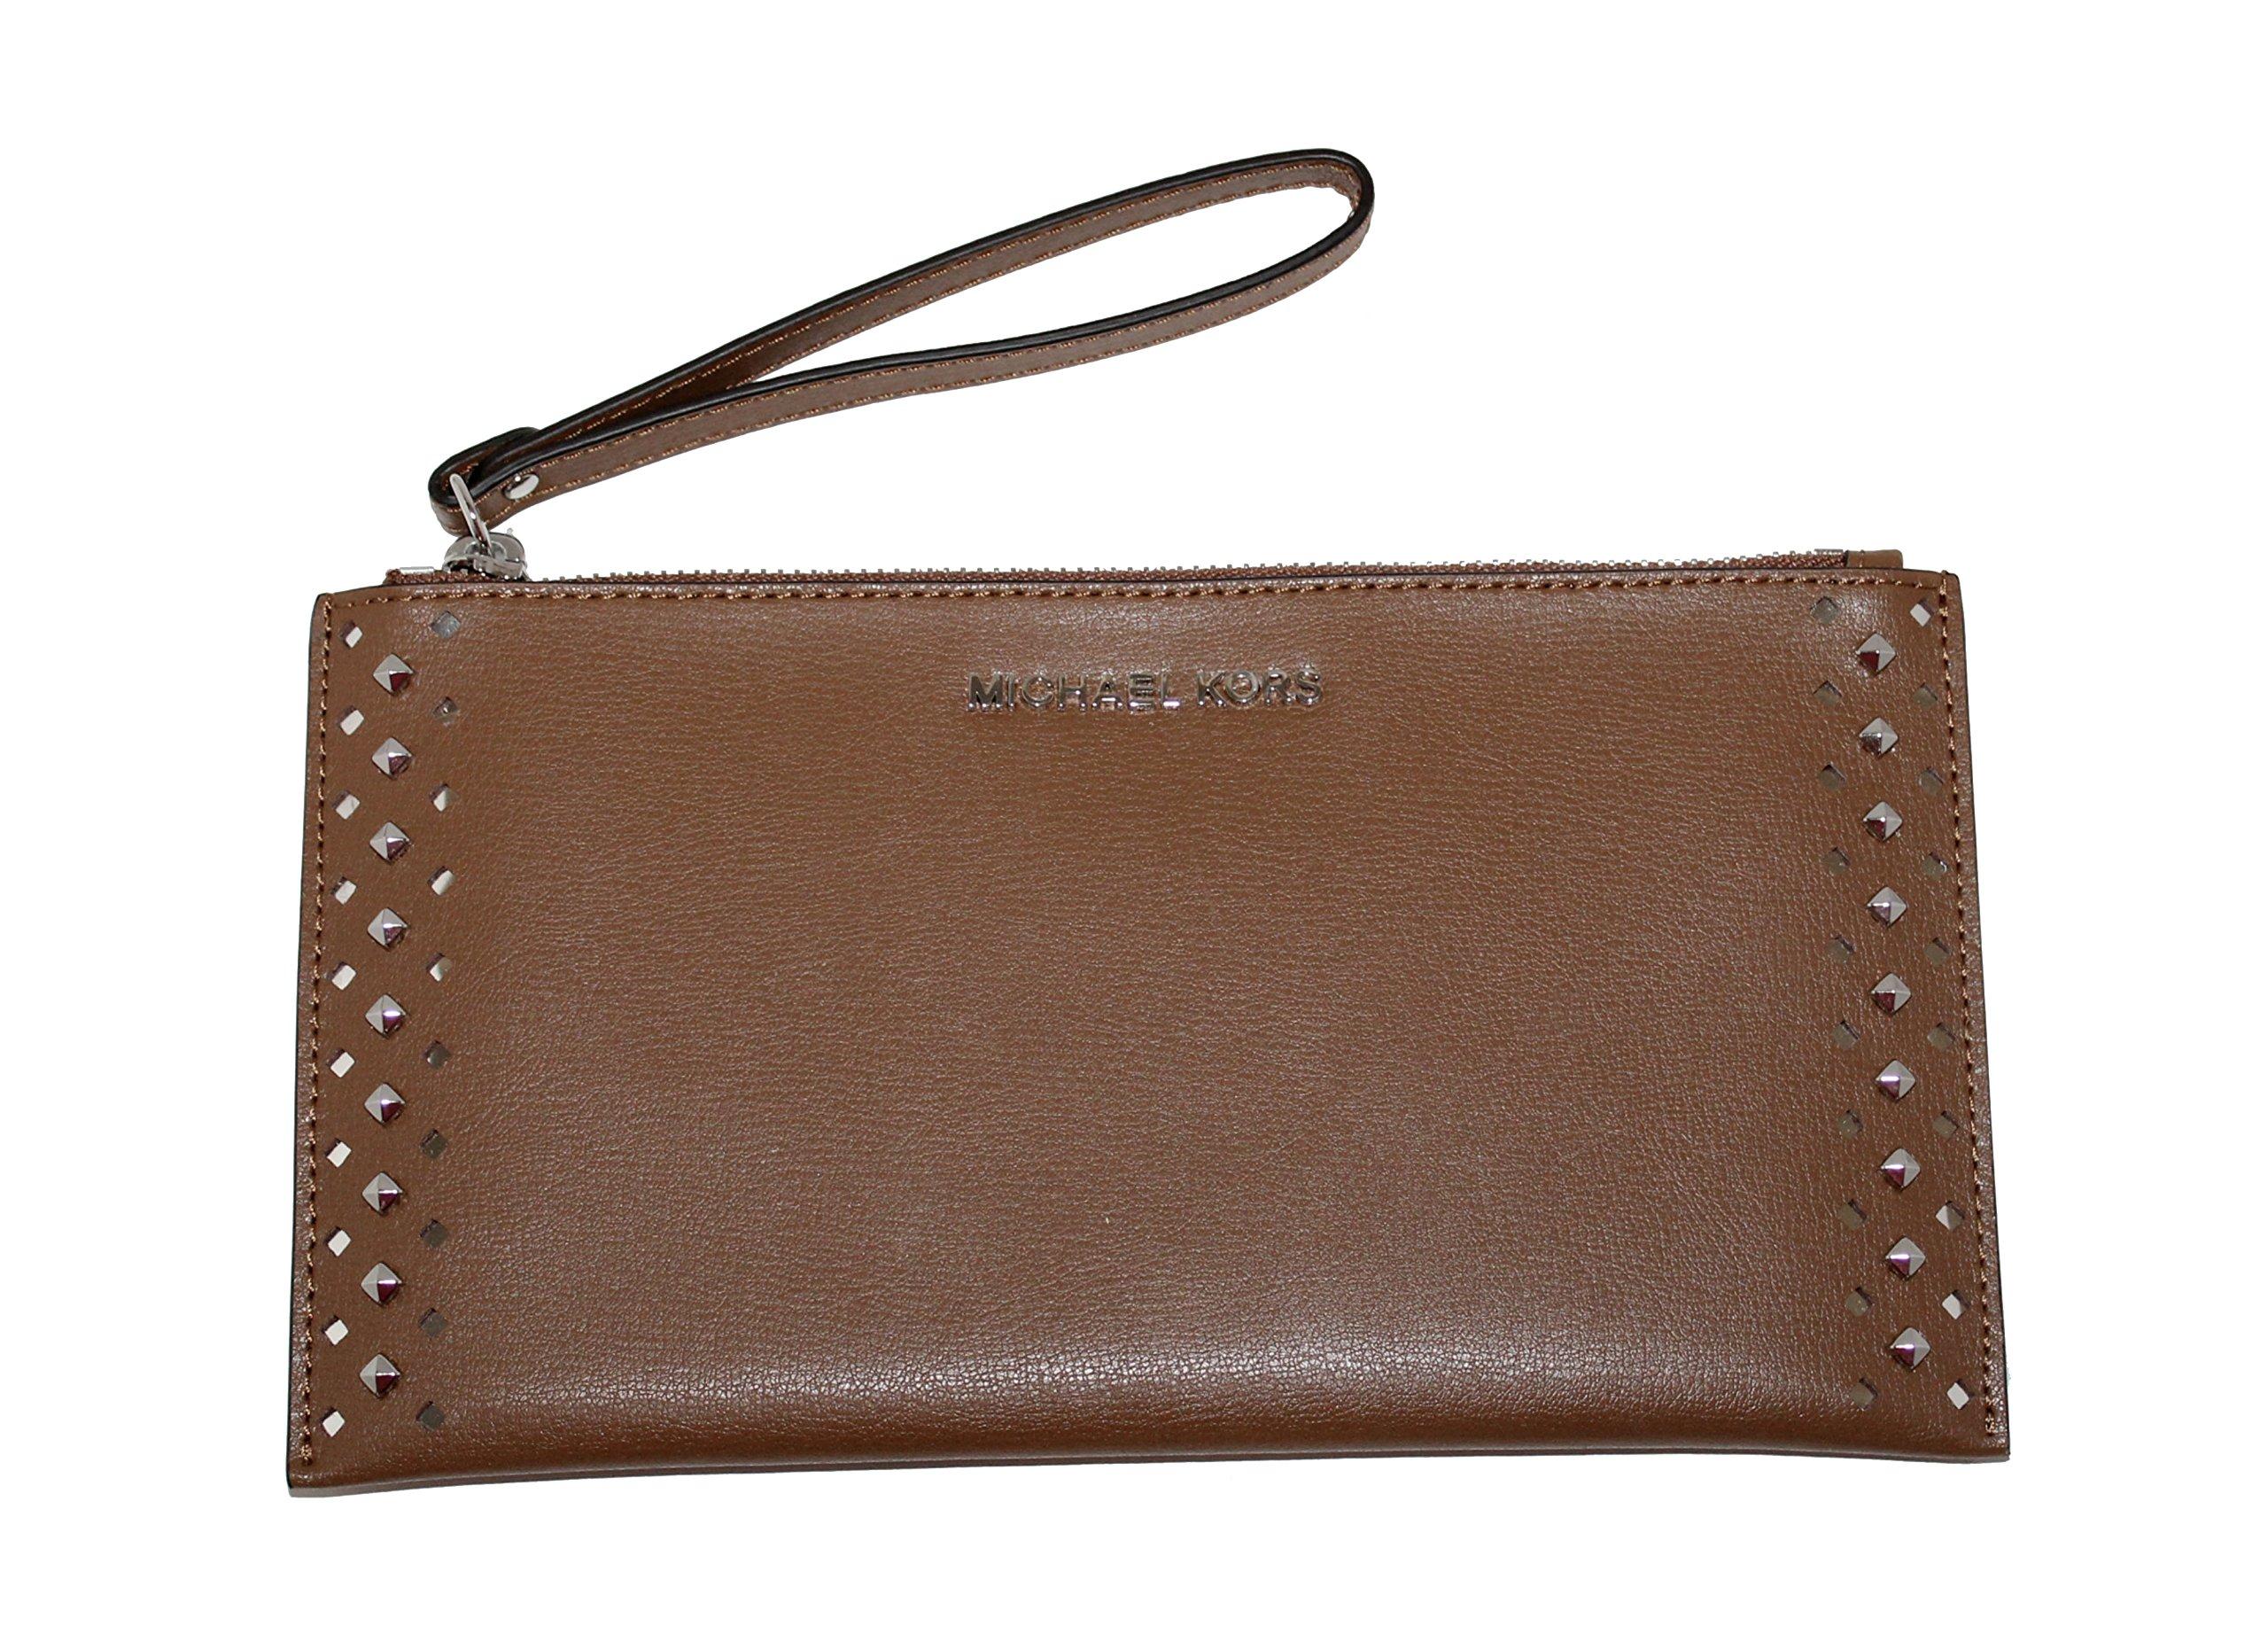 MICHAEL Michael Kors Women's Jet Set Travel Leather Zip Clutch (Luggage)